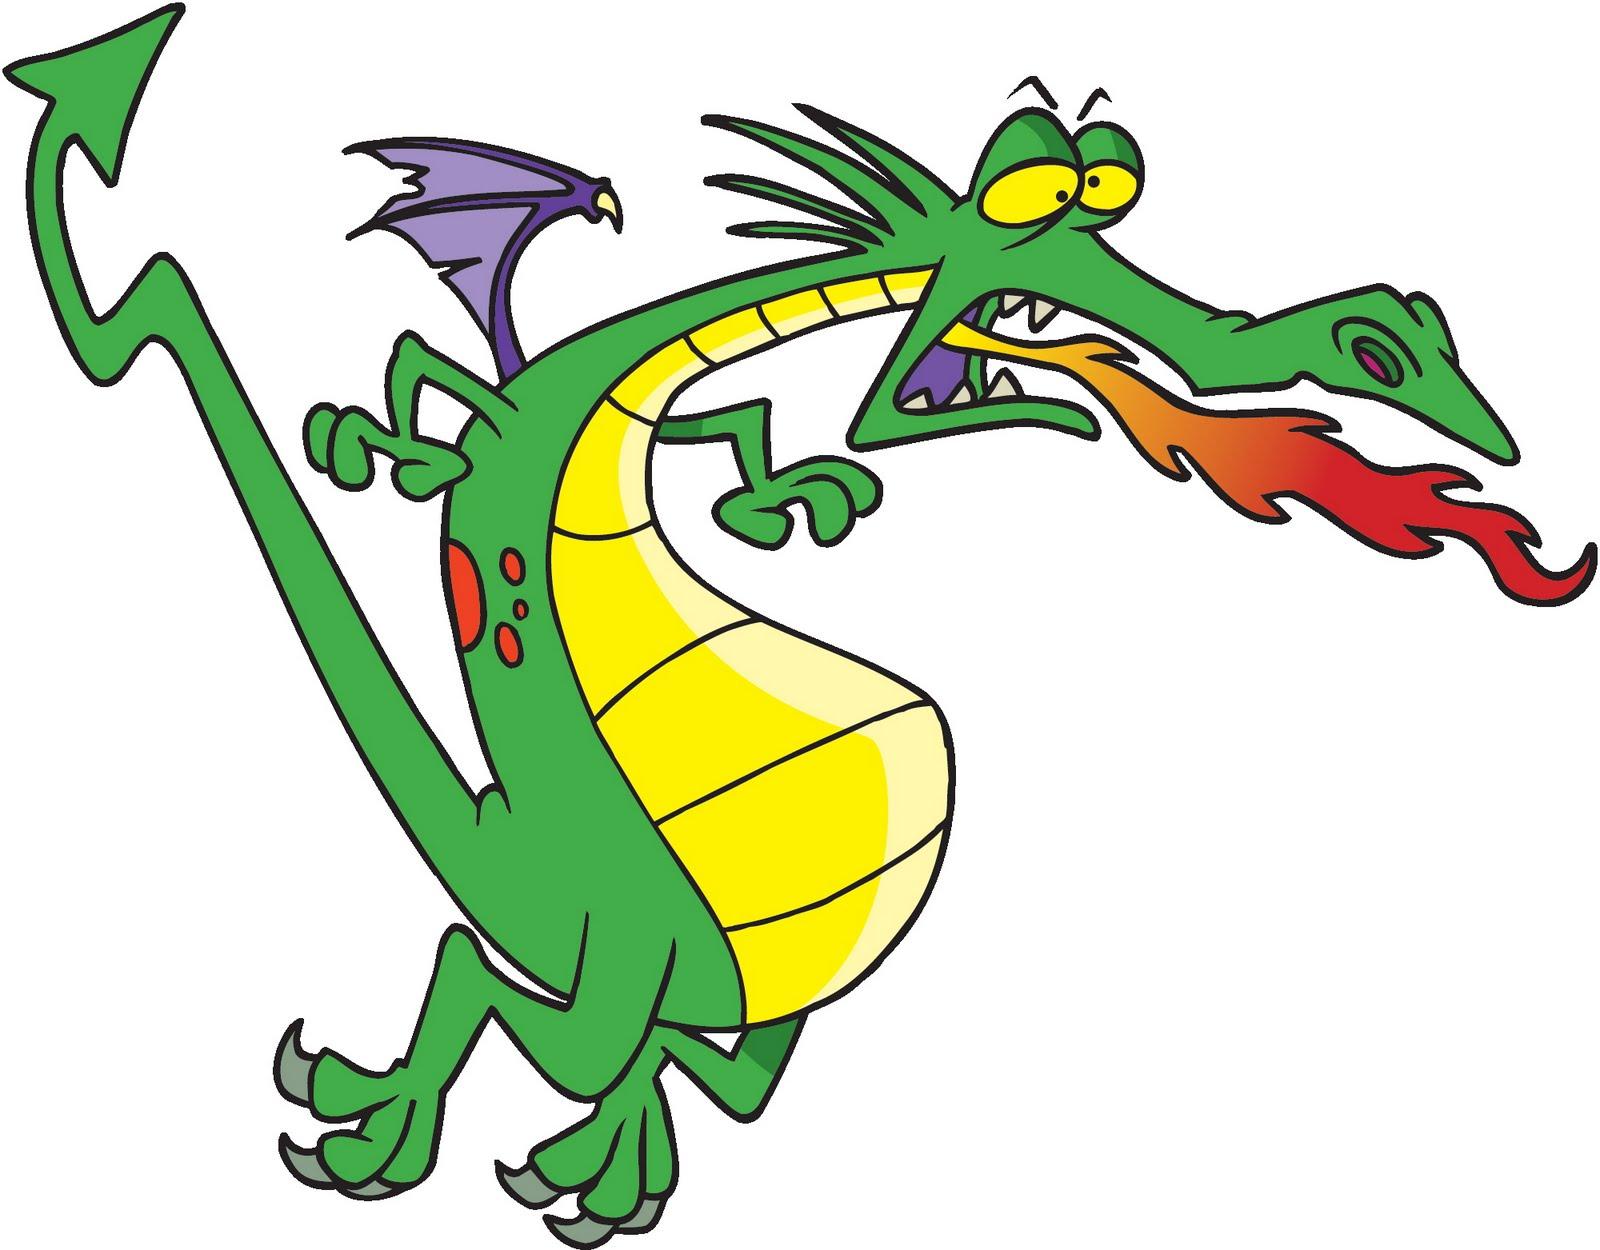 Fire Breathing Dragon Tattoo Designs Cartoon Dragon Breathing Fire